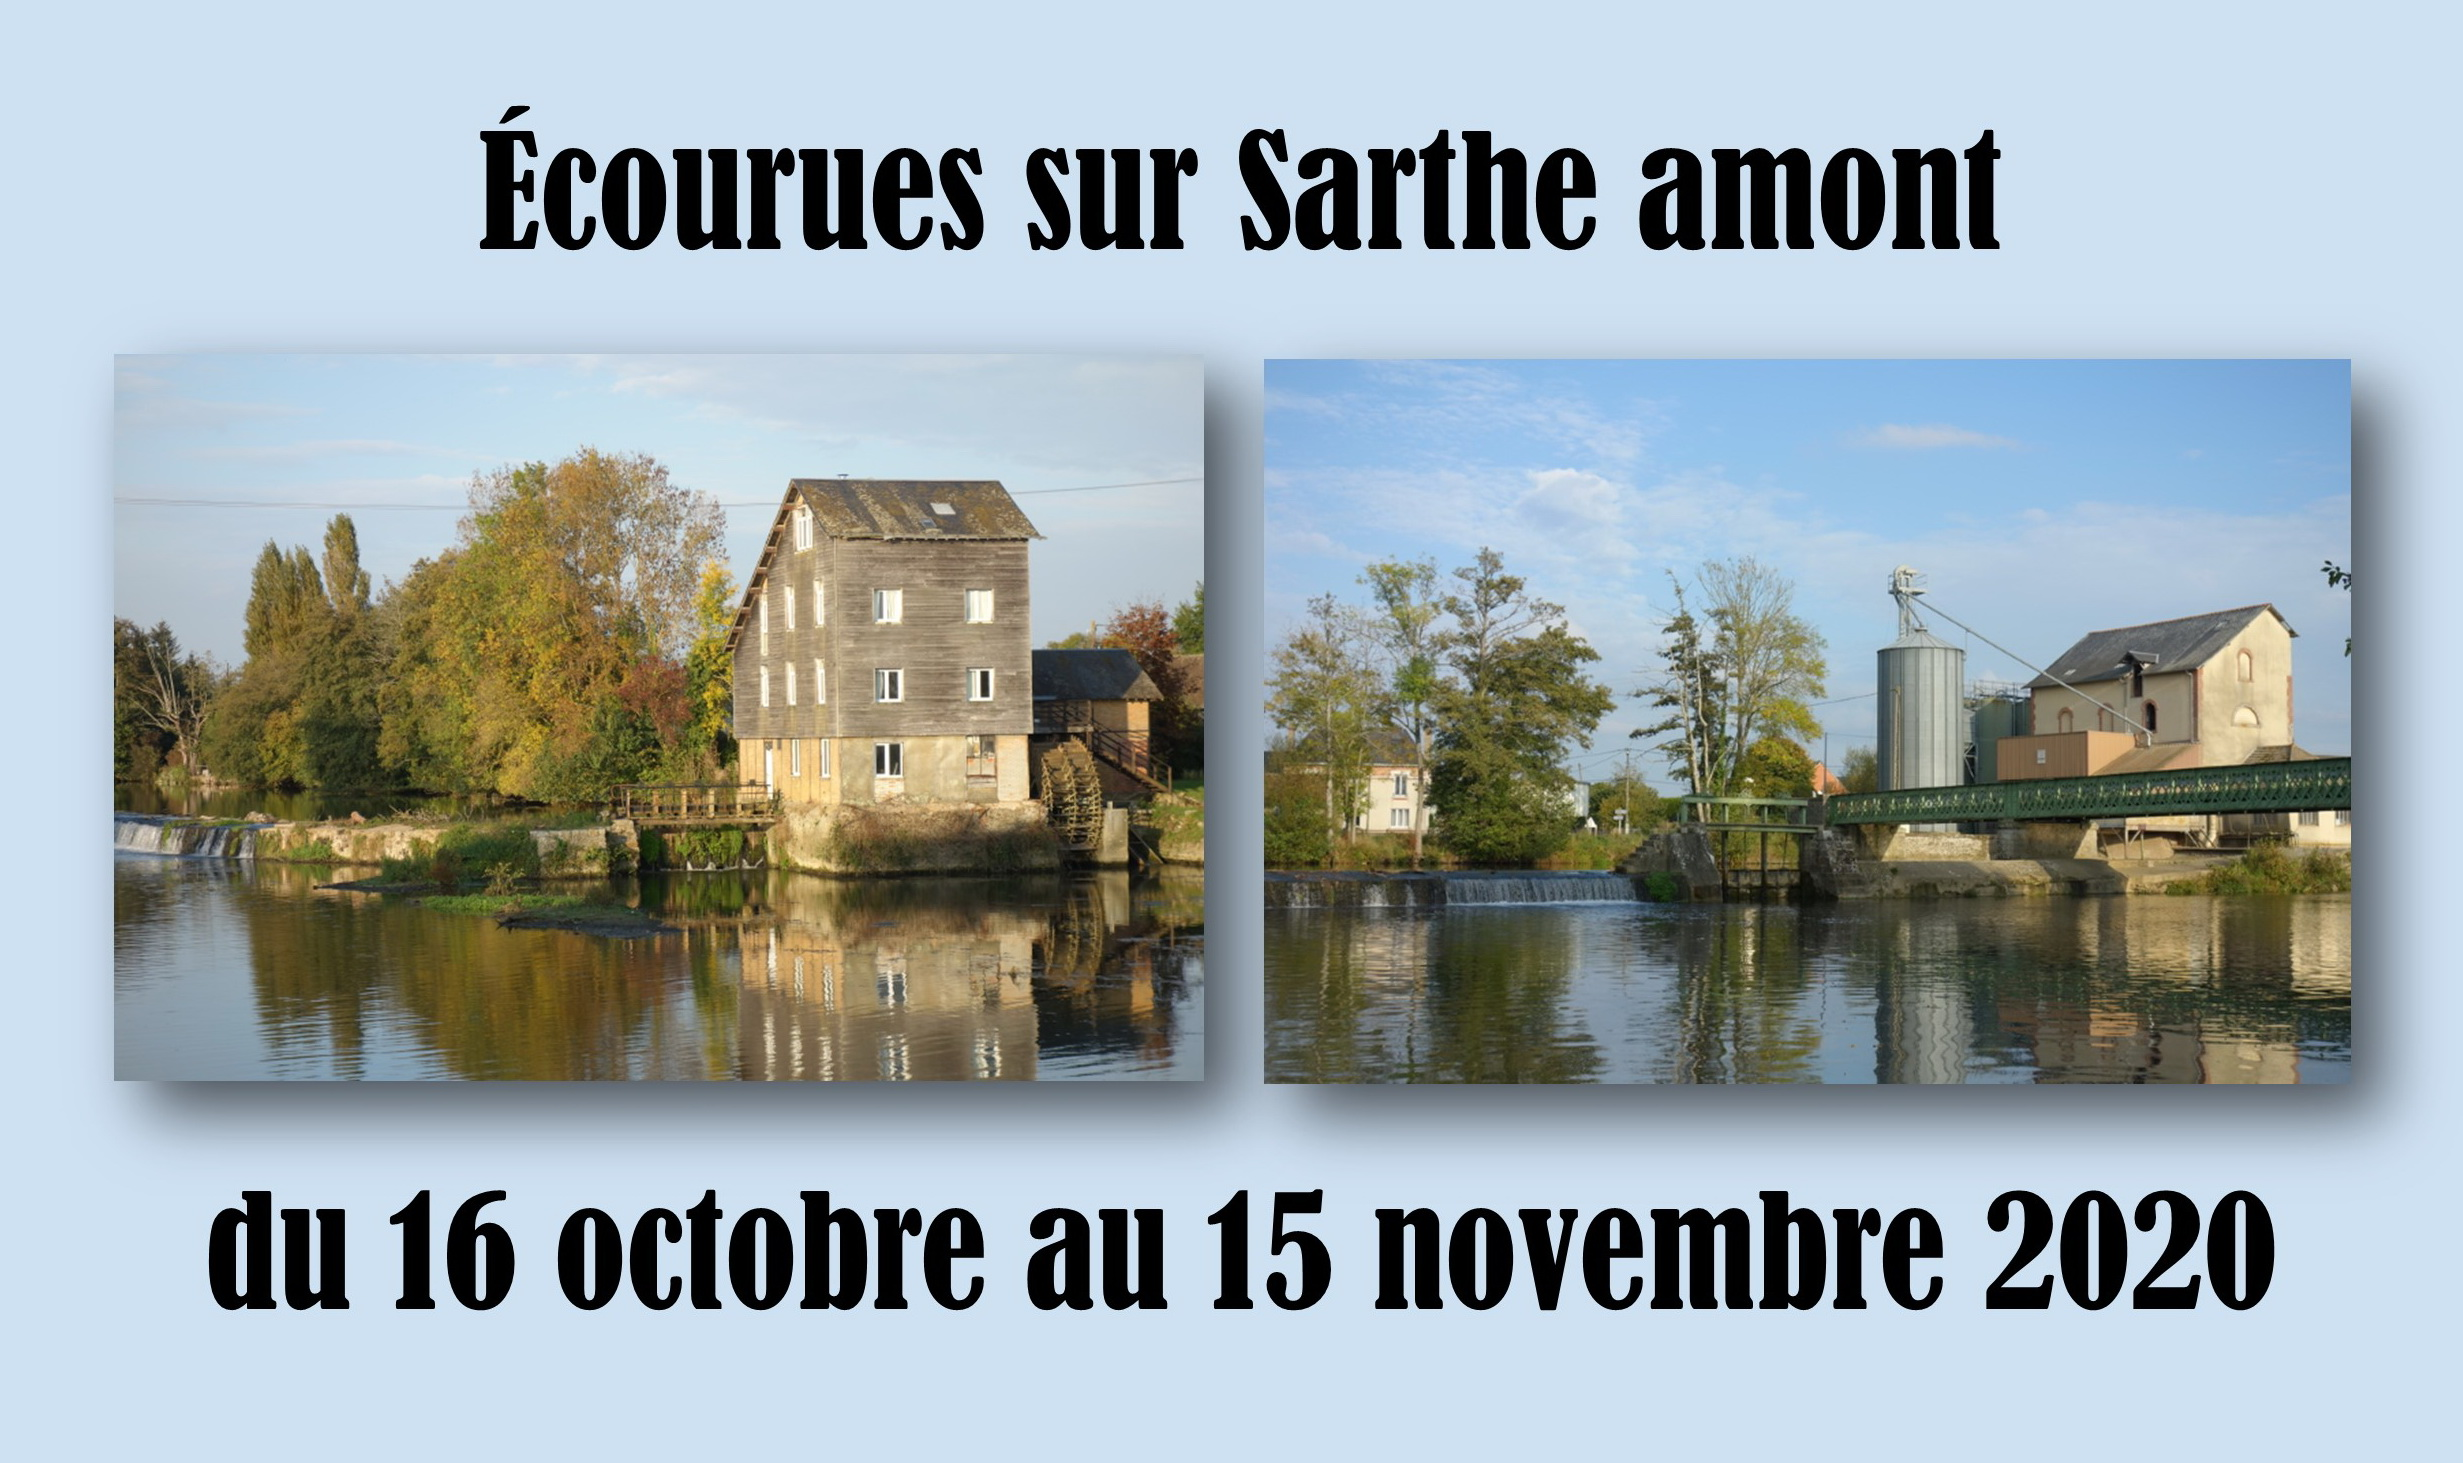 Écourues Sarthe amont 2020